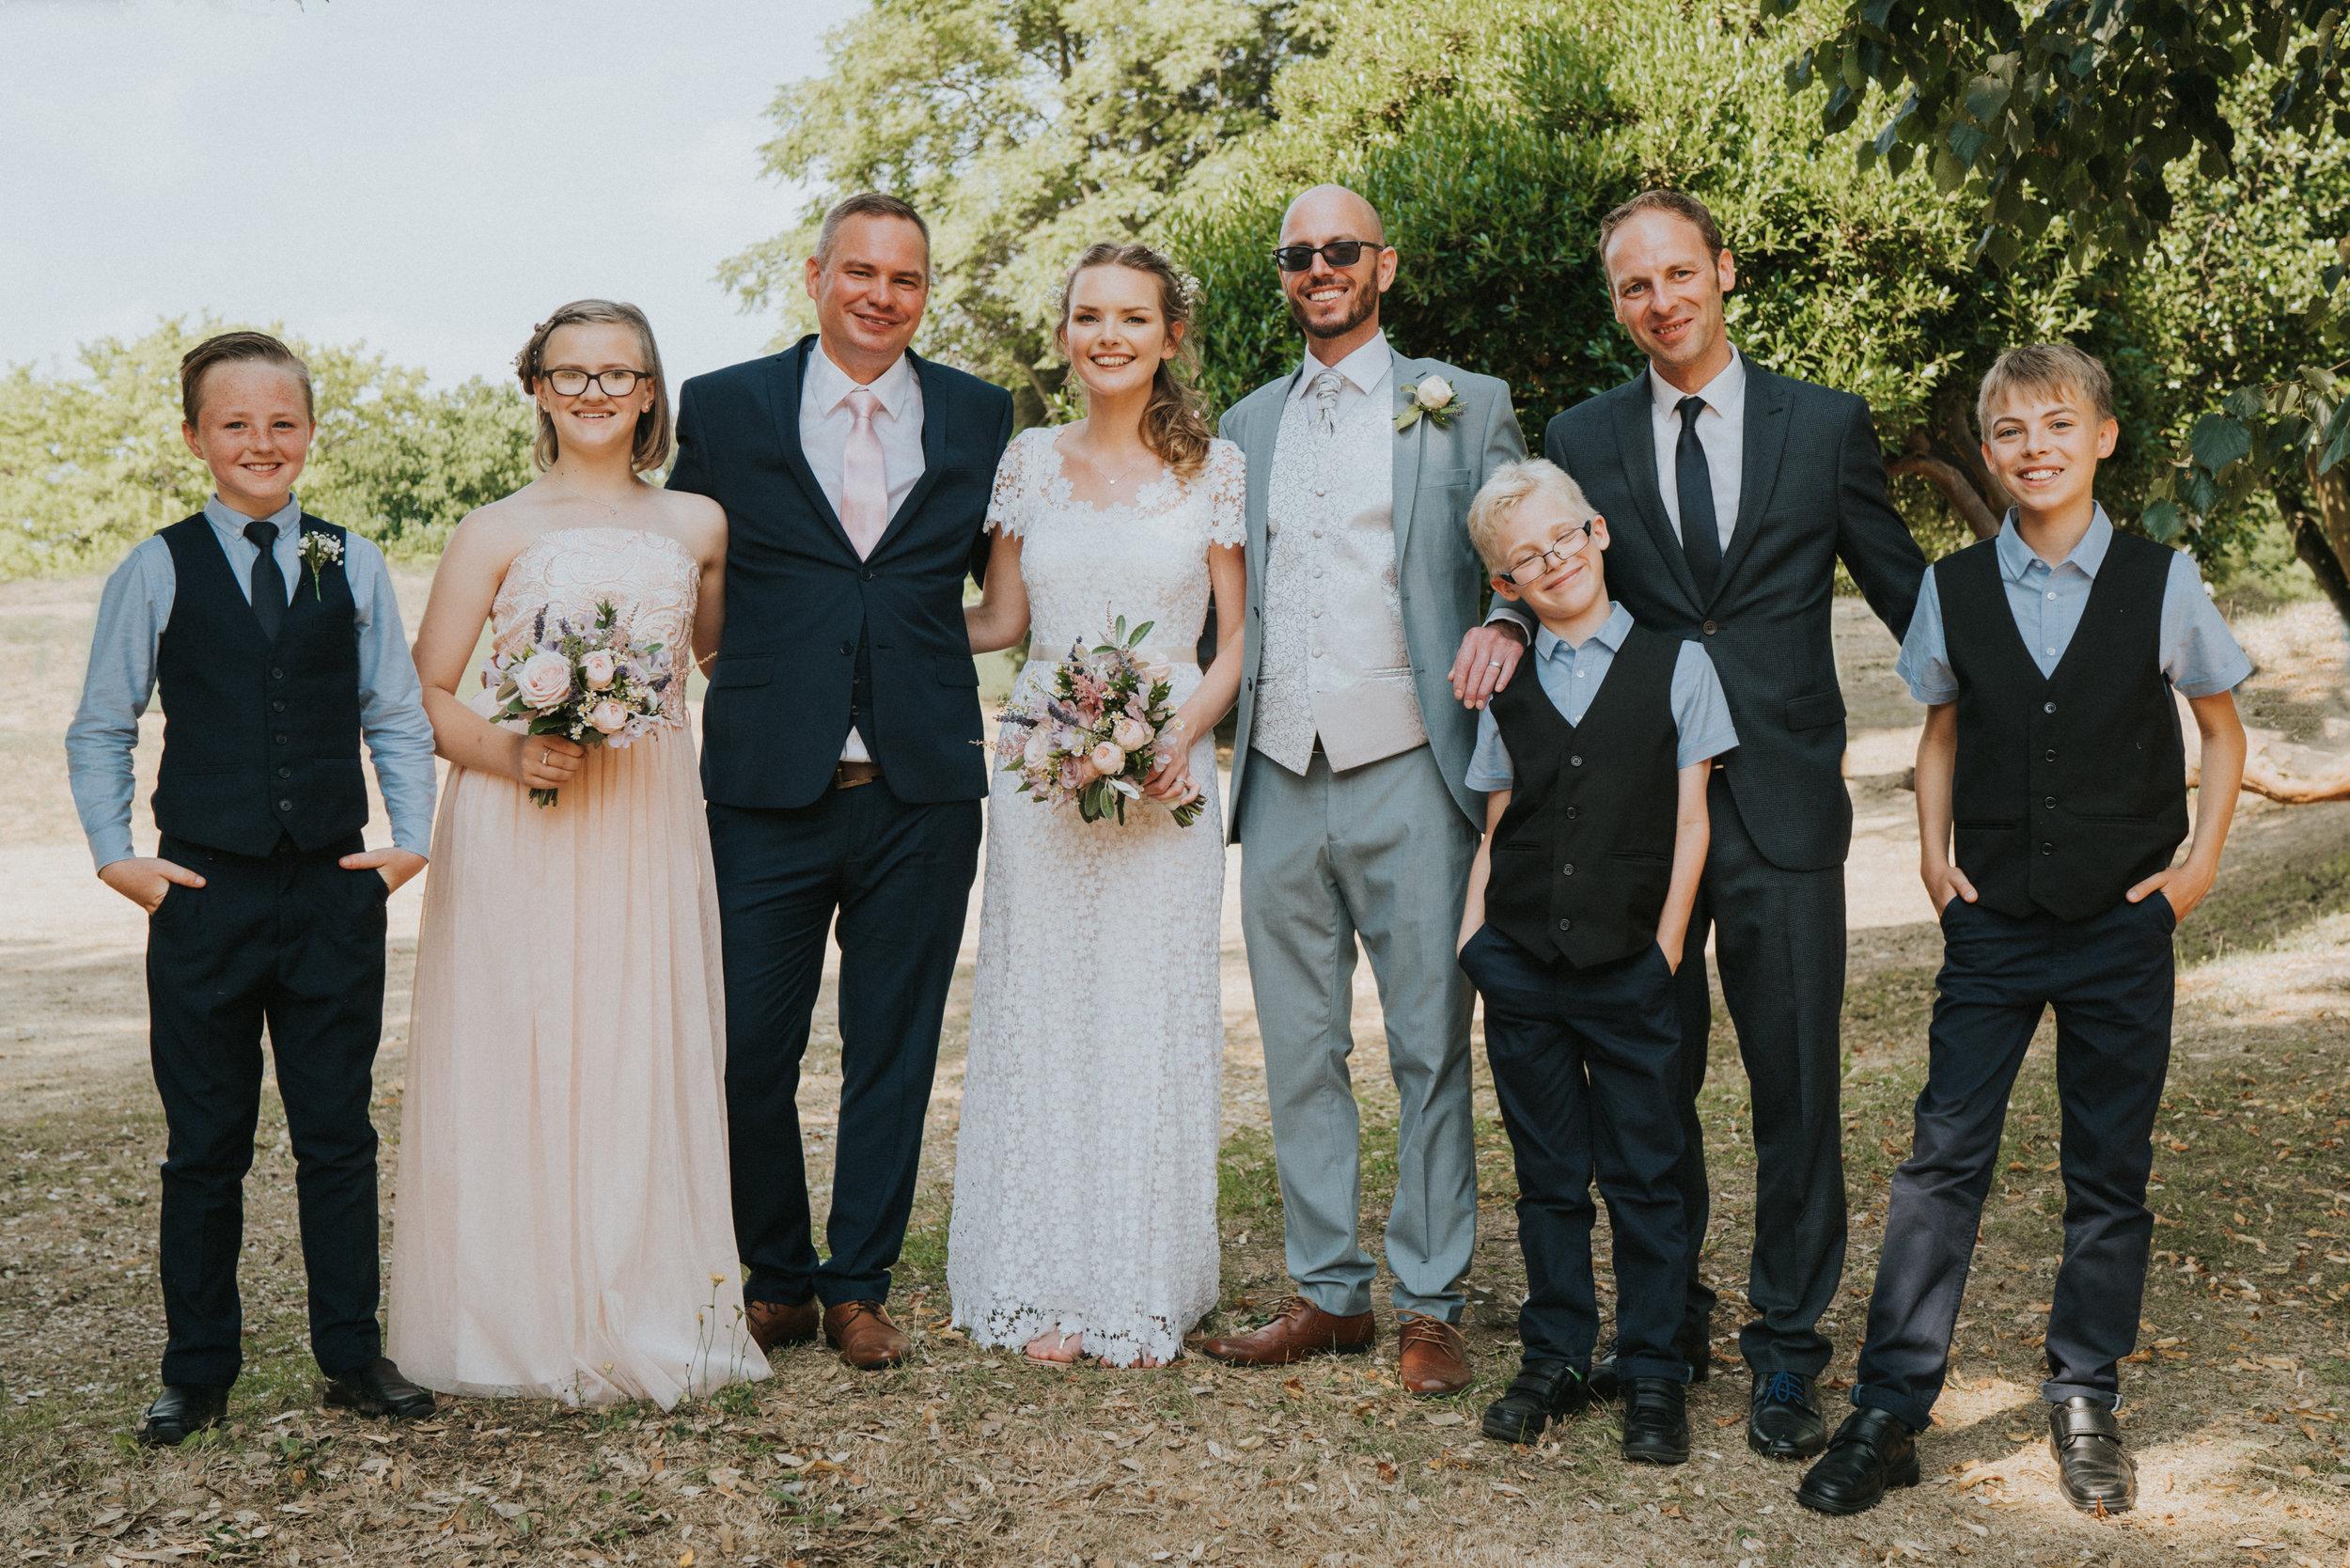 Grace-Elizabeth-Georgie-Amalaketu-Firstsite-Colchester-Essex-Boho-Buddhist-Wedding-Alternative-Wedding-Photography-Essex (75 of 100).jpg